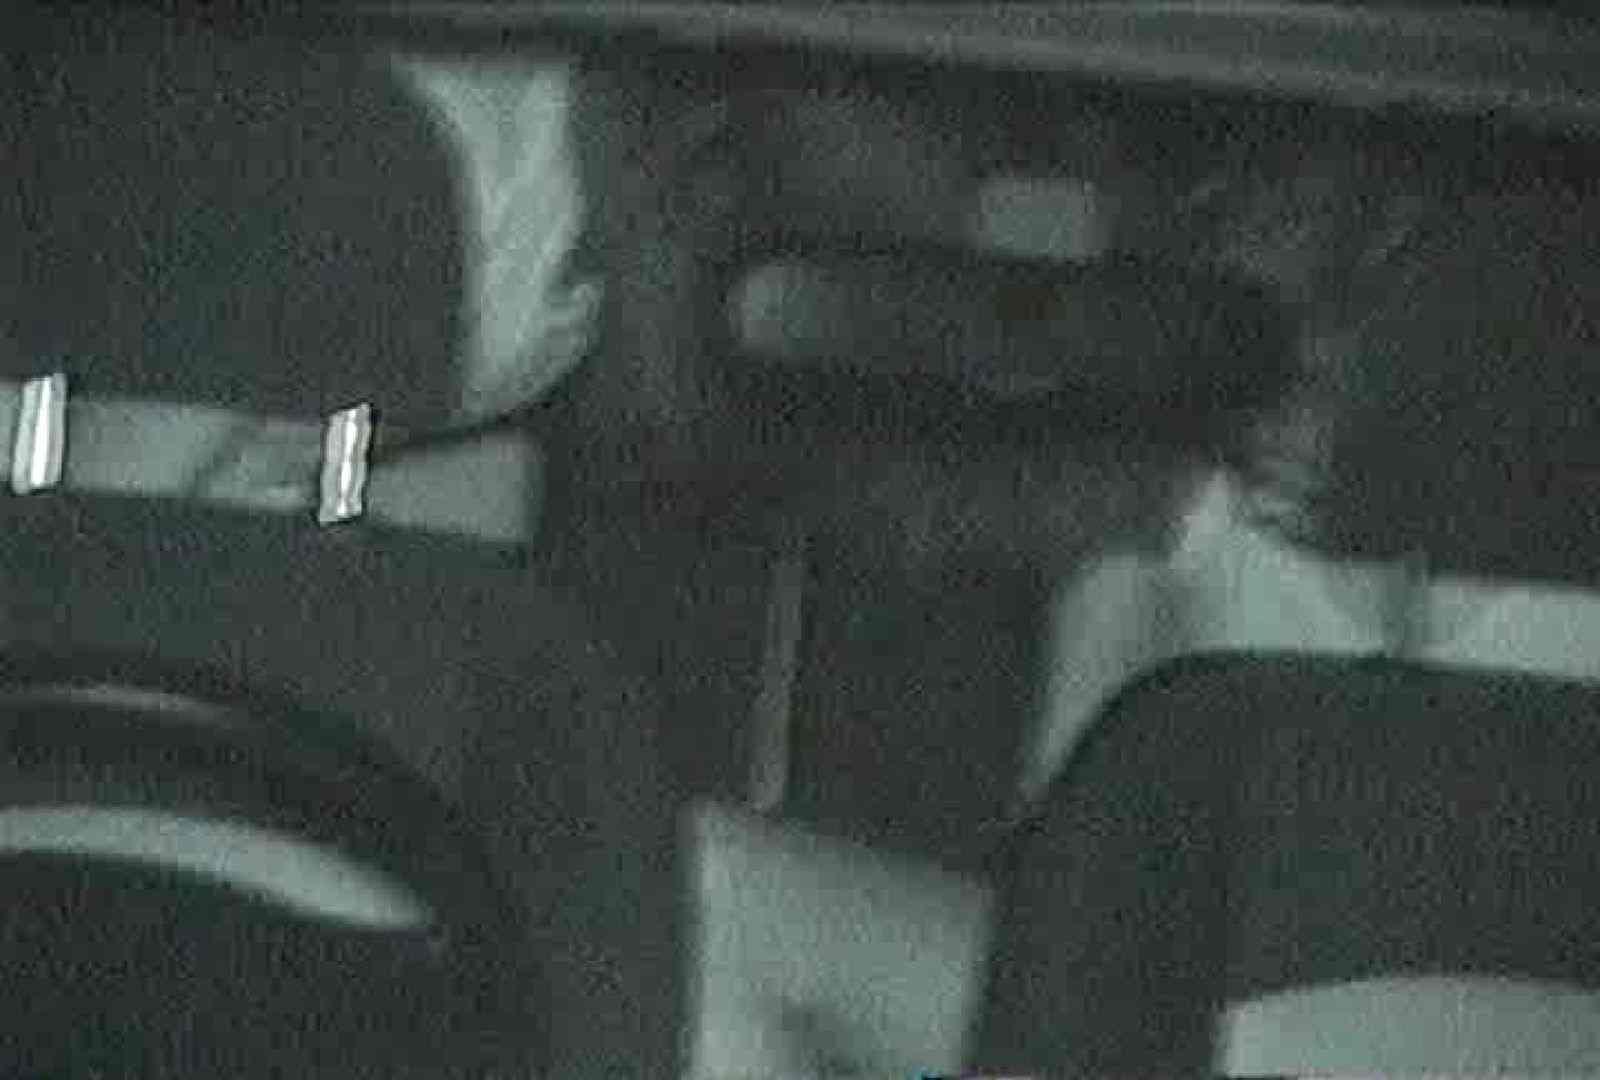 充血監督の深夜の運動会Vol.86 接写 セックス無修正動画無料 98画像 55